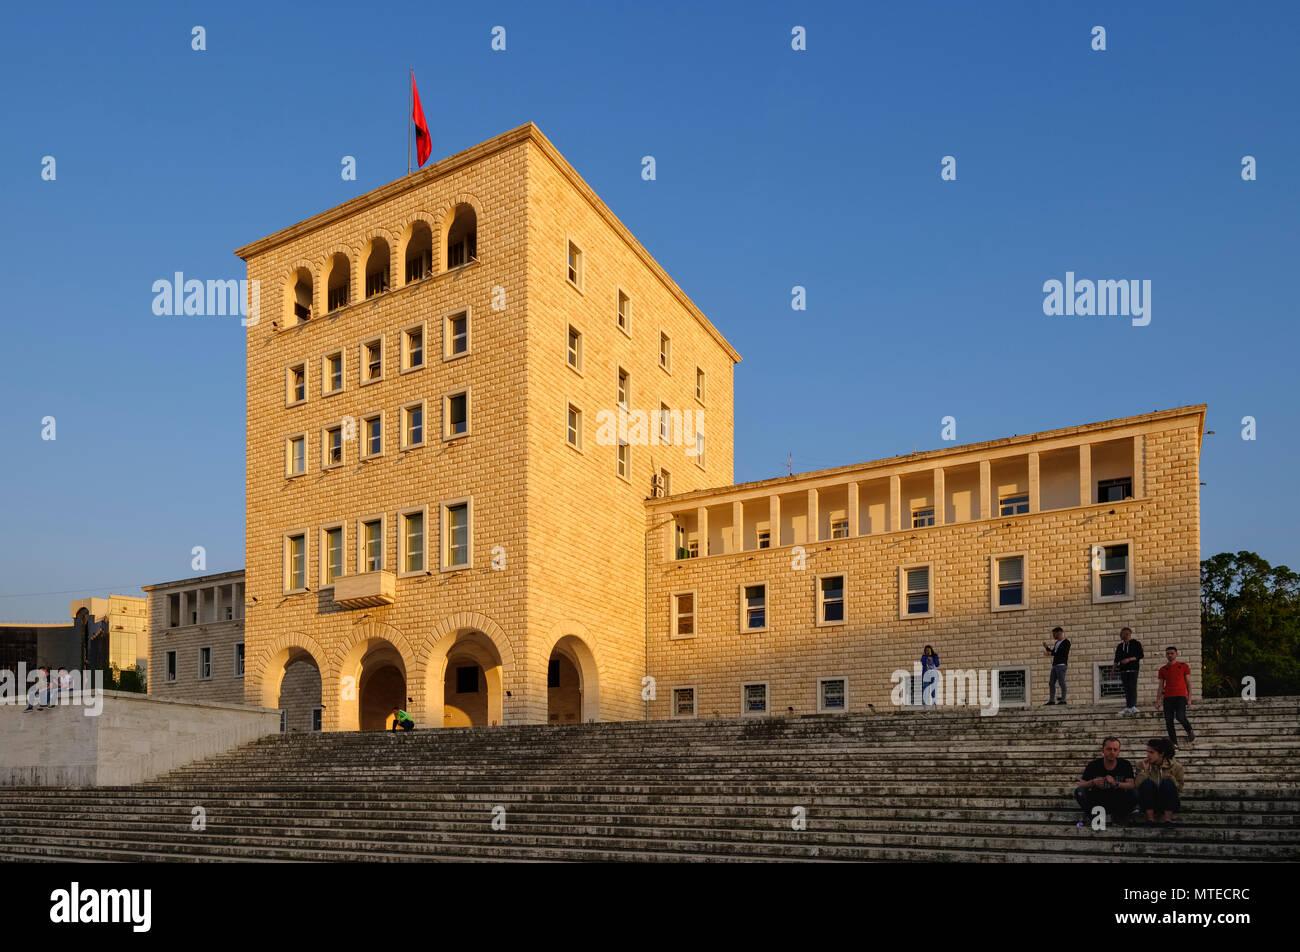 University of Tirana at Mother Teresa Square, Tirana, Albania - Stock Image